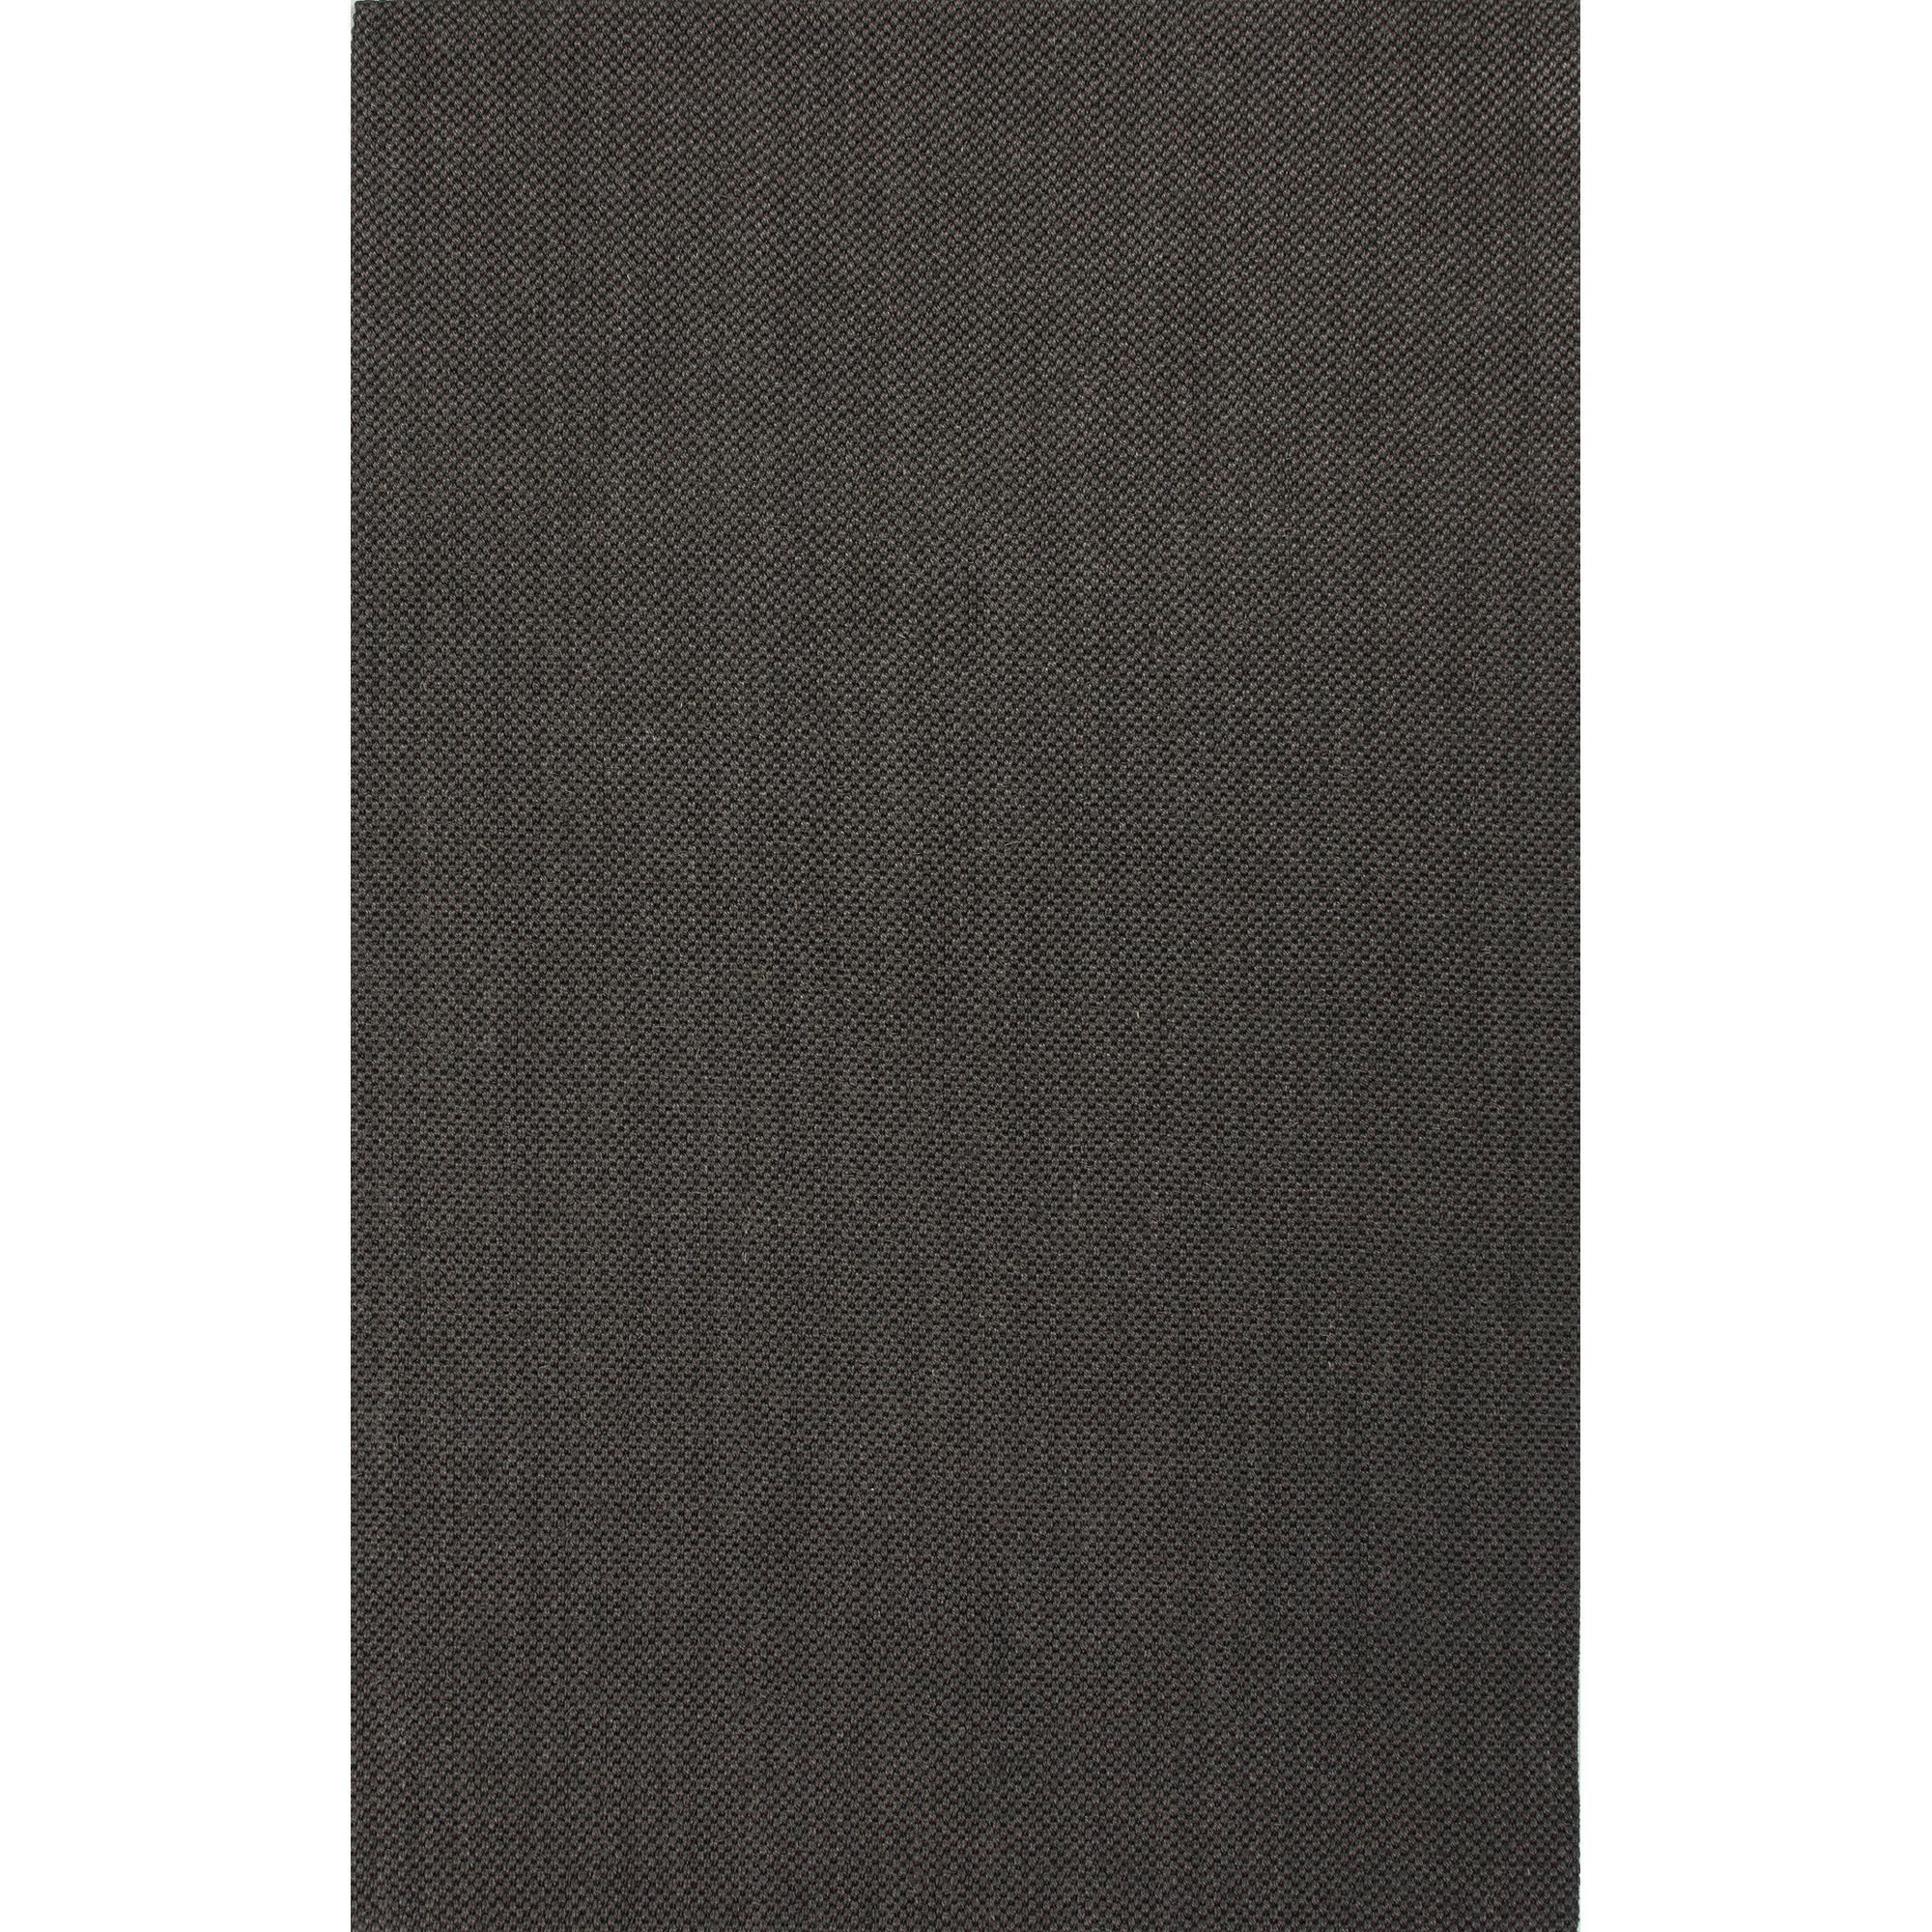 JAIPUR Rugs Naturals Sanibel 8 x 10 Rug - Item Number: RUG119170